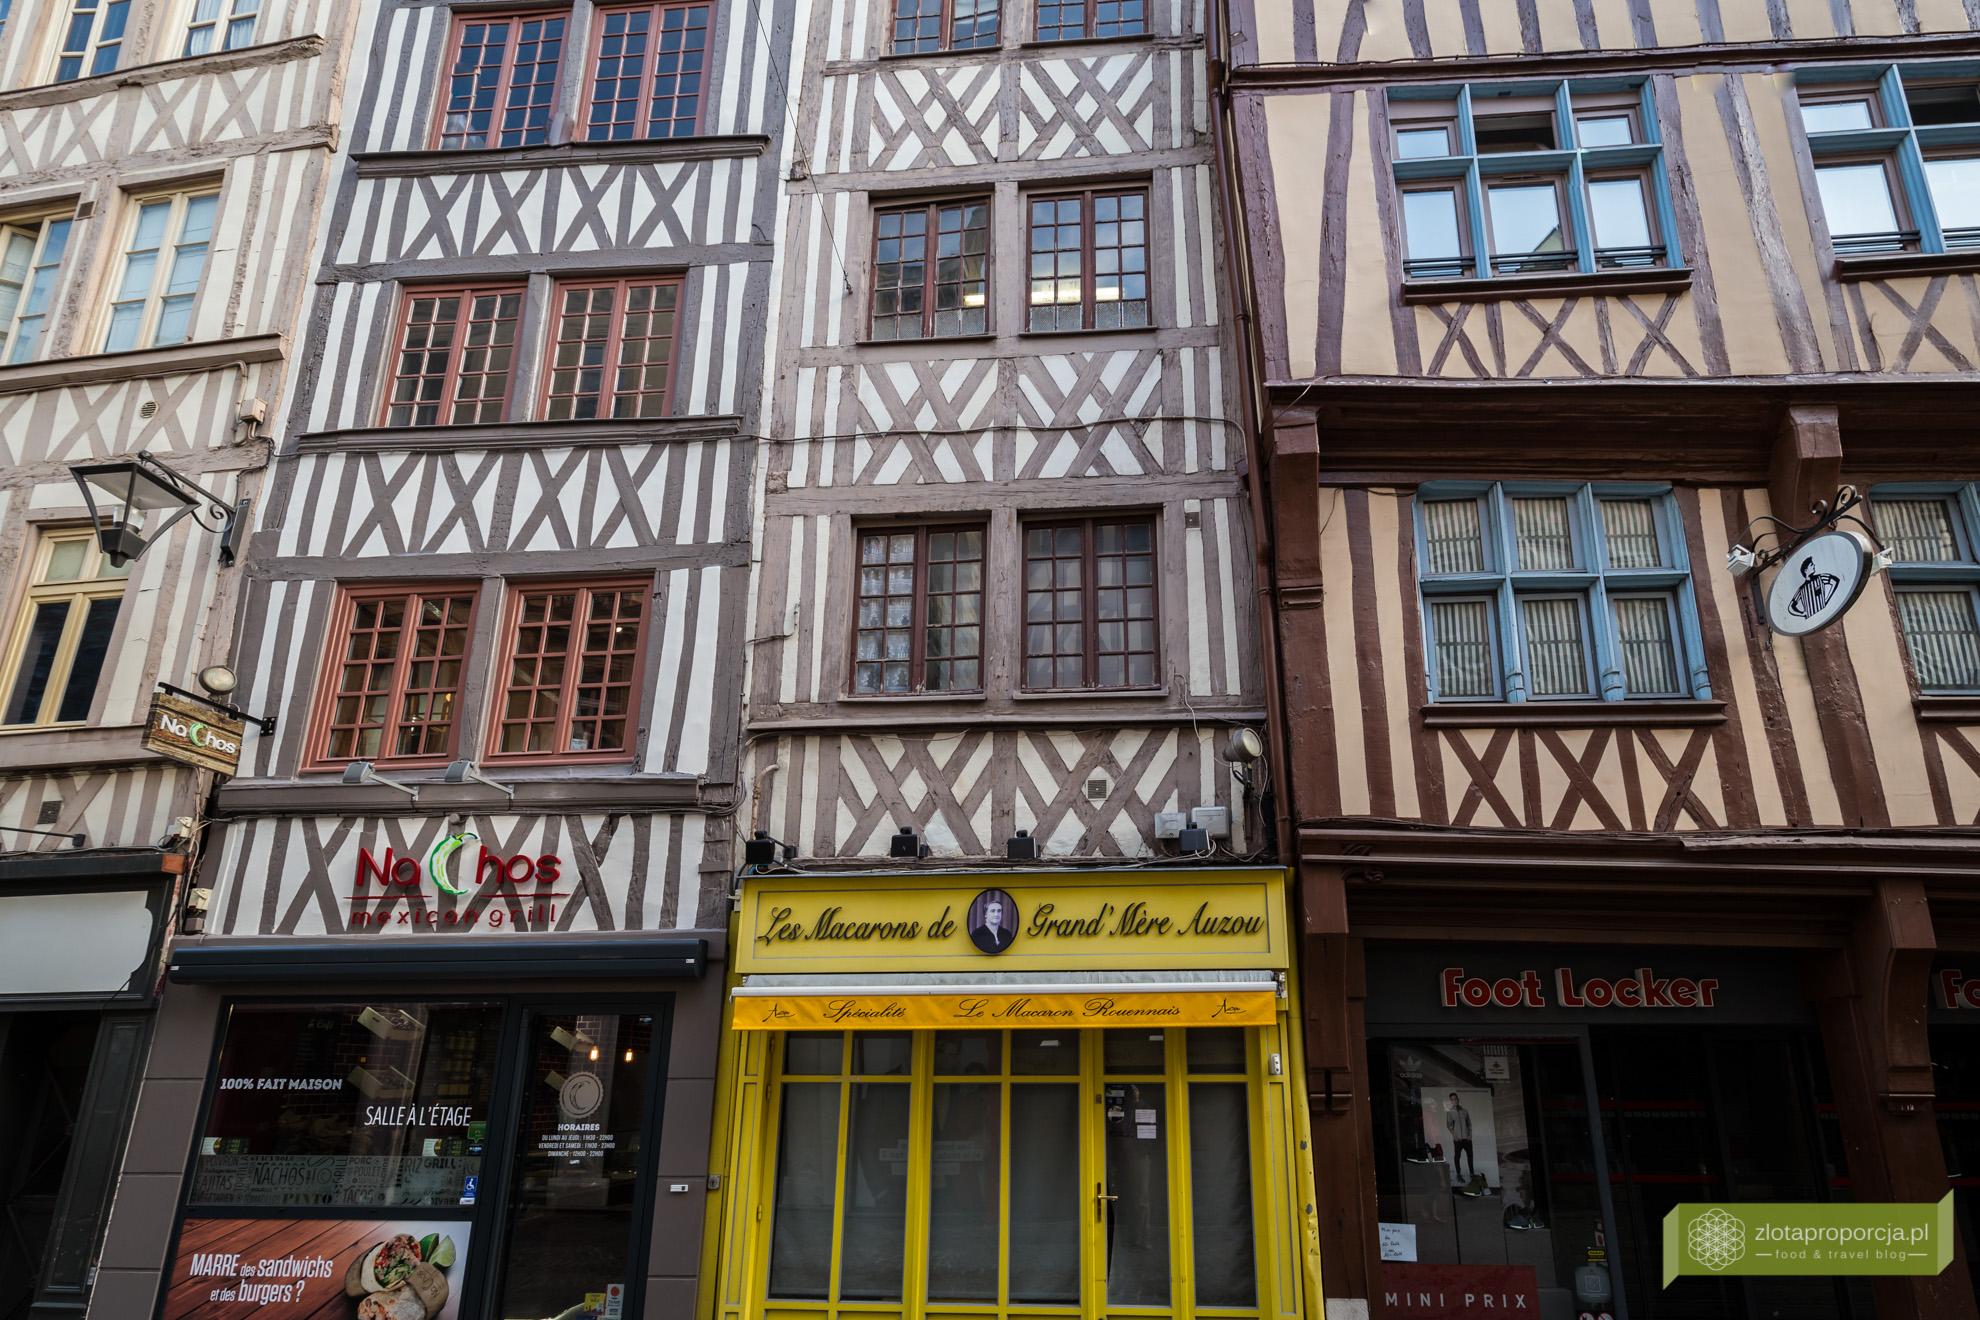 Rouen,vNormandia, atrakcje Rouen, atrakcje Normandii, Francja, zabytkowe kamienice w Rouen